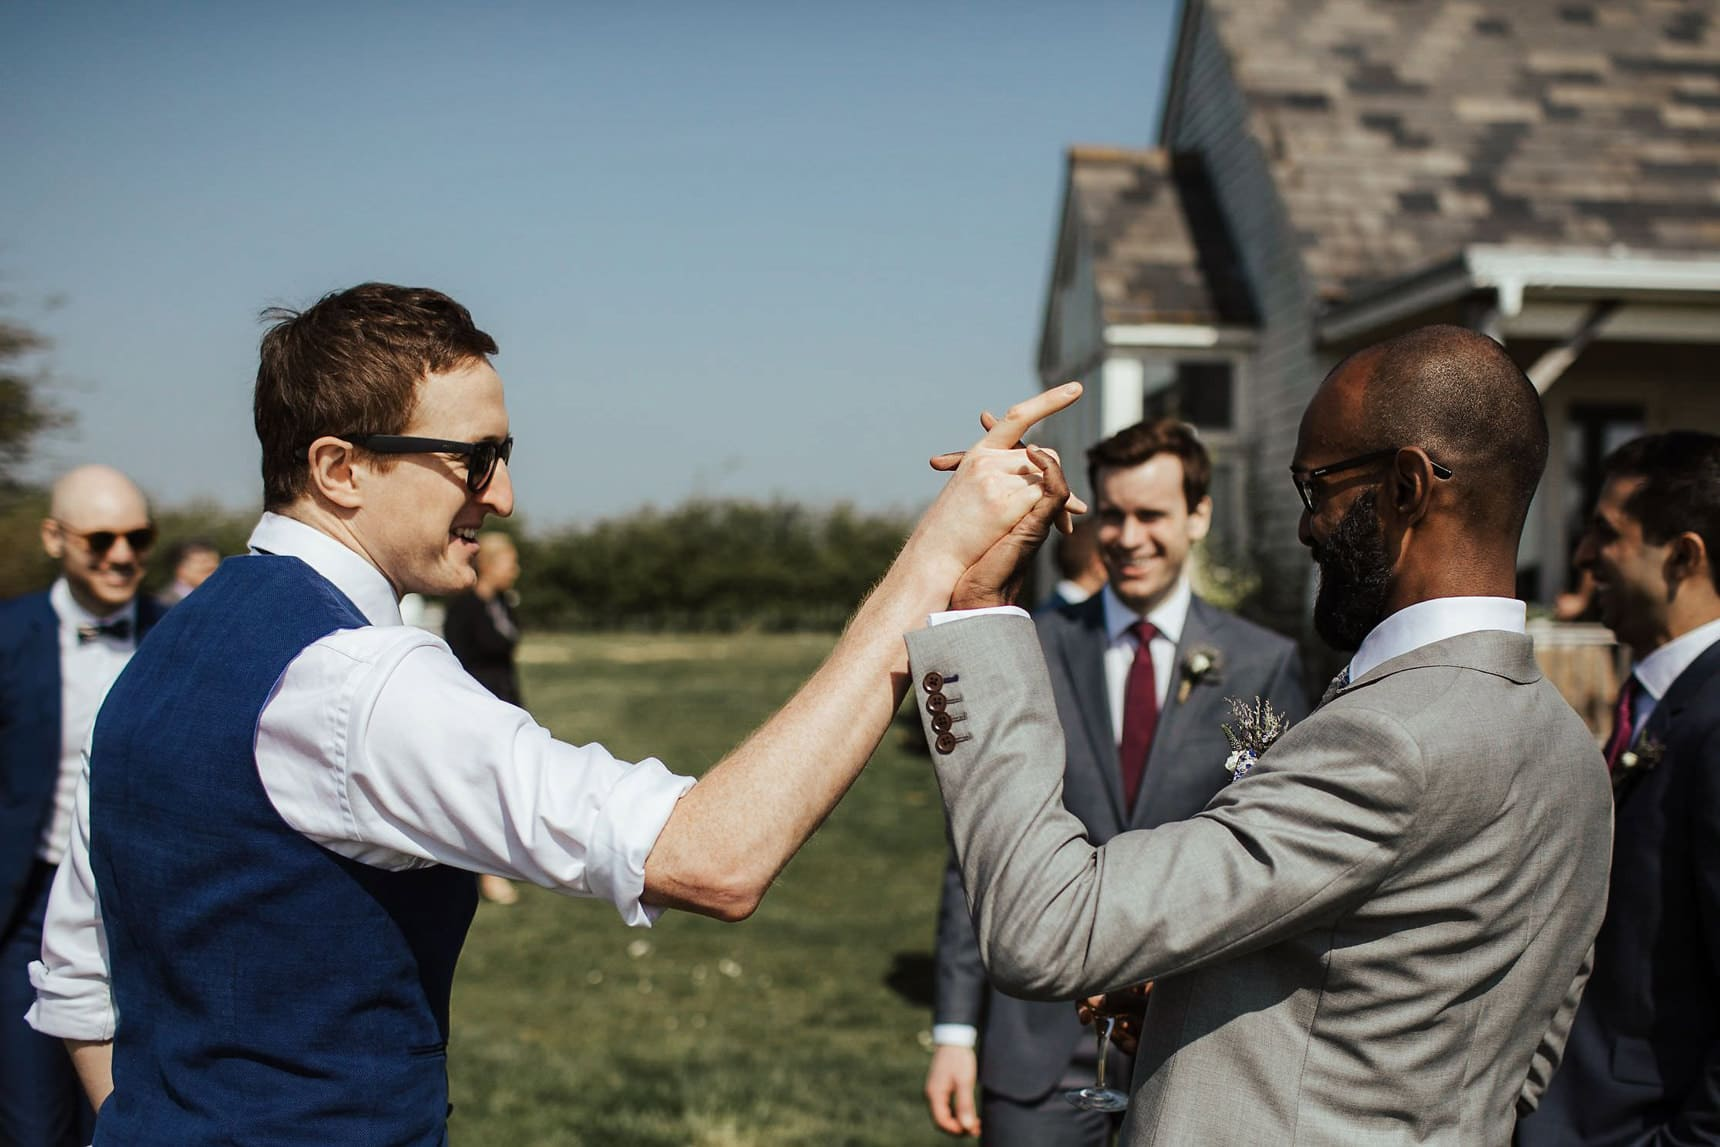 outdoor wedding osea island essex